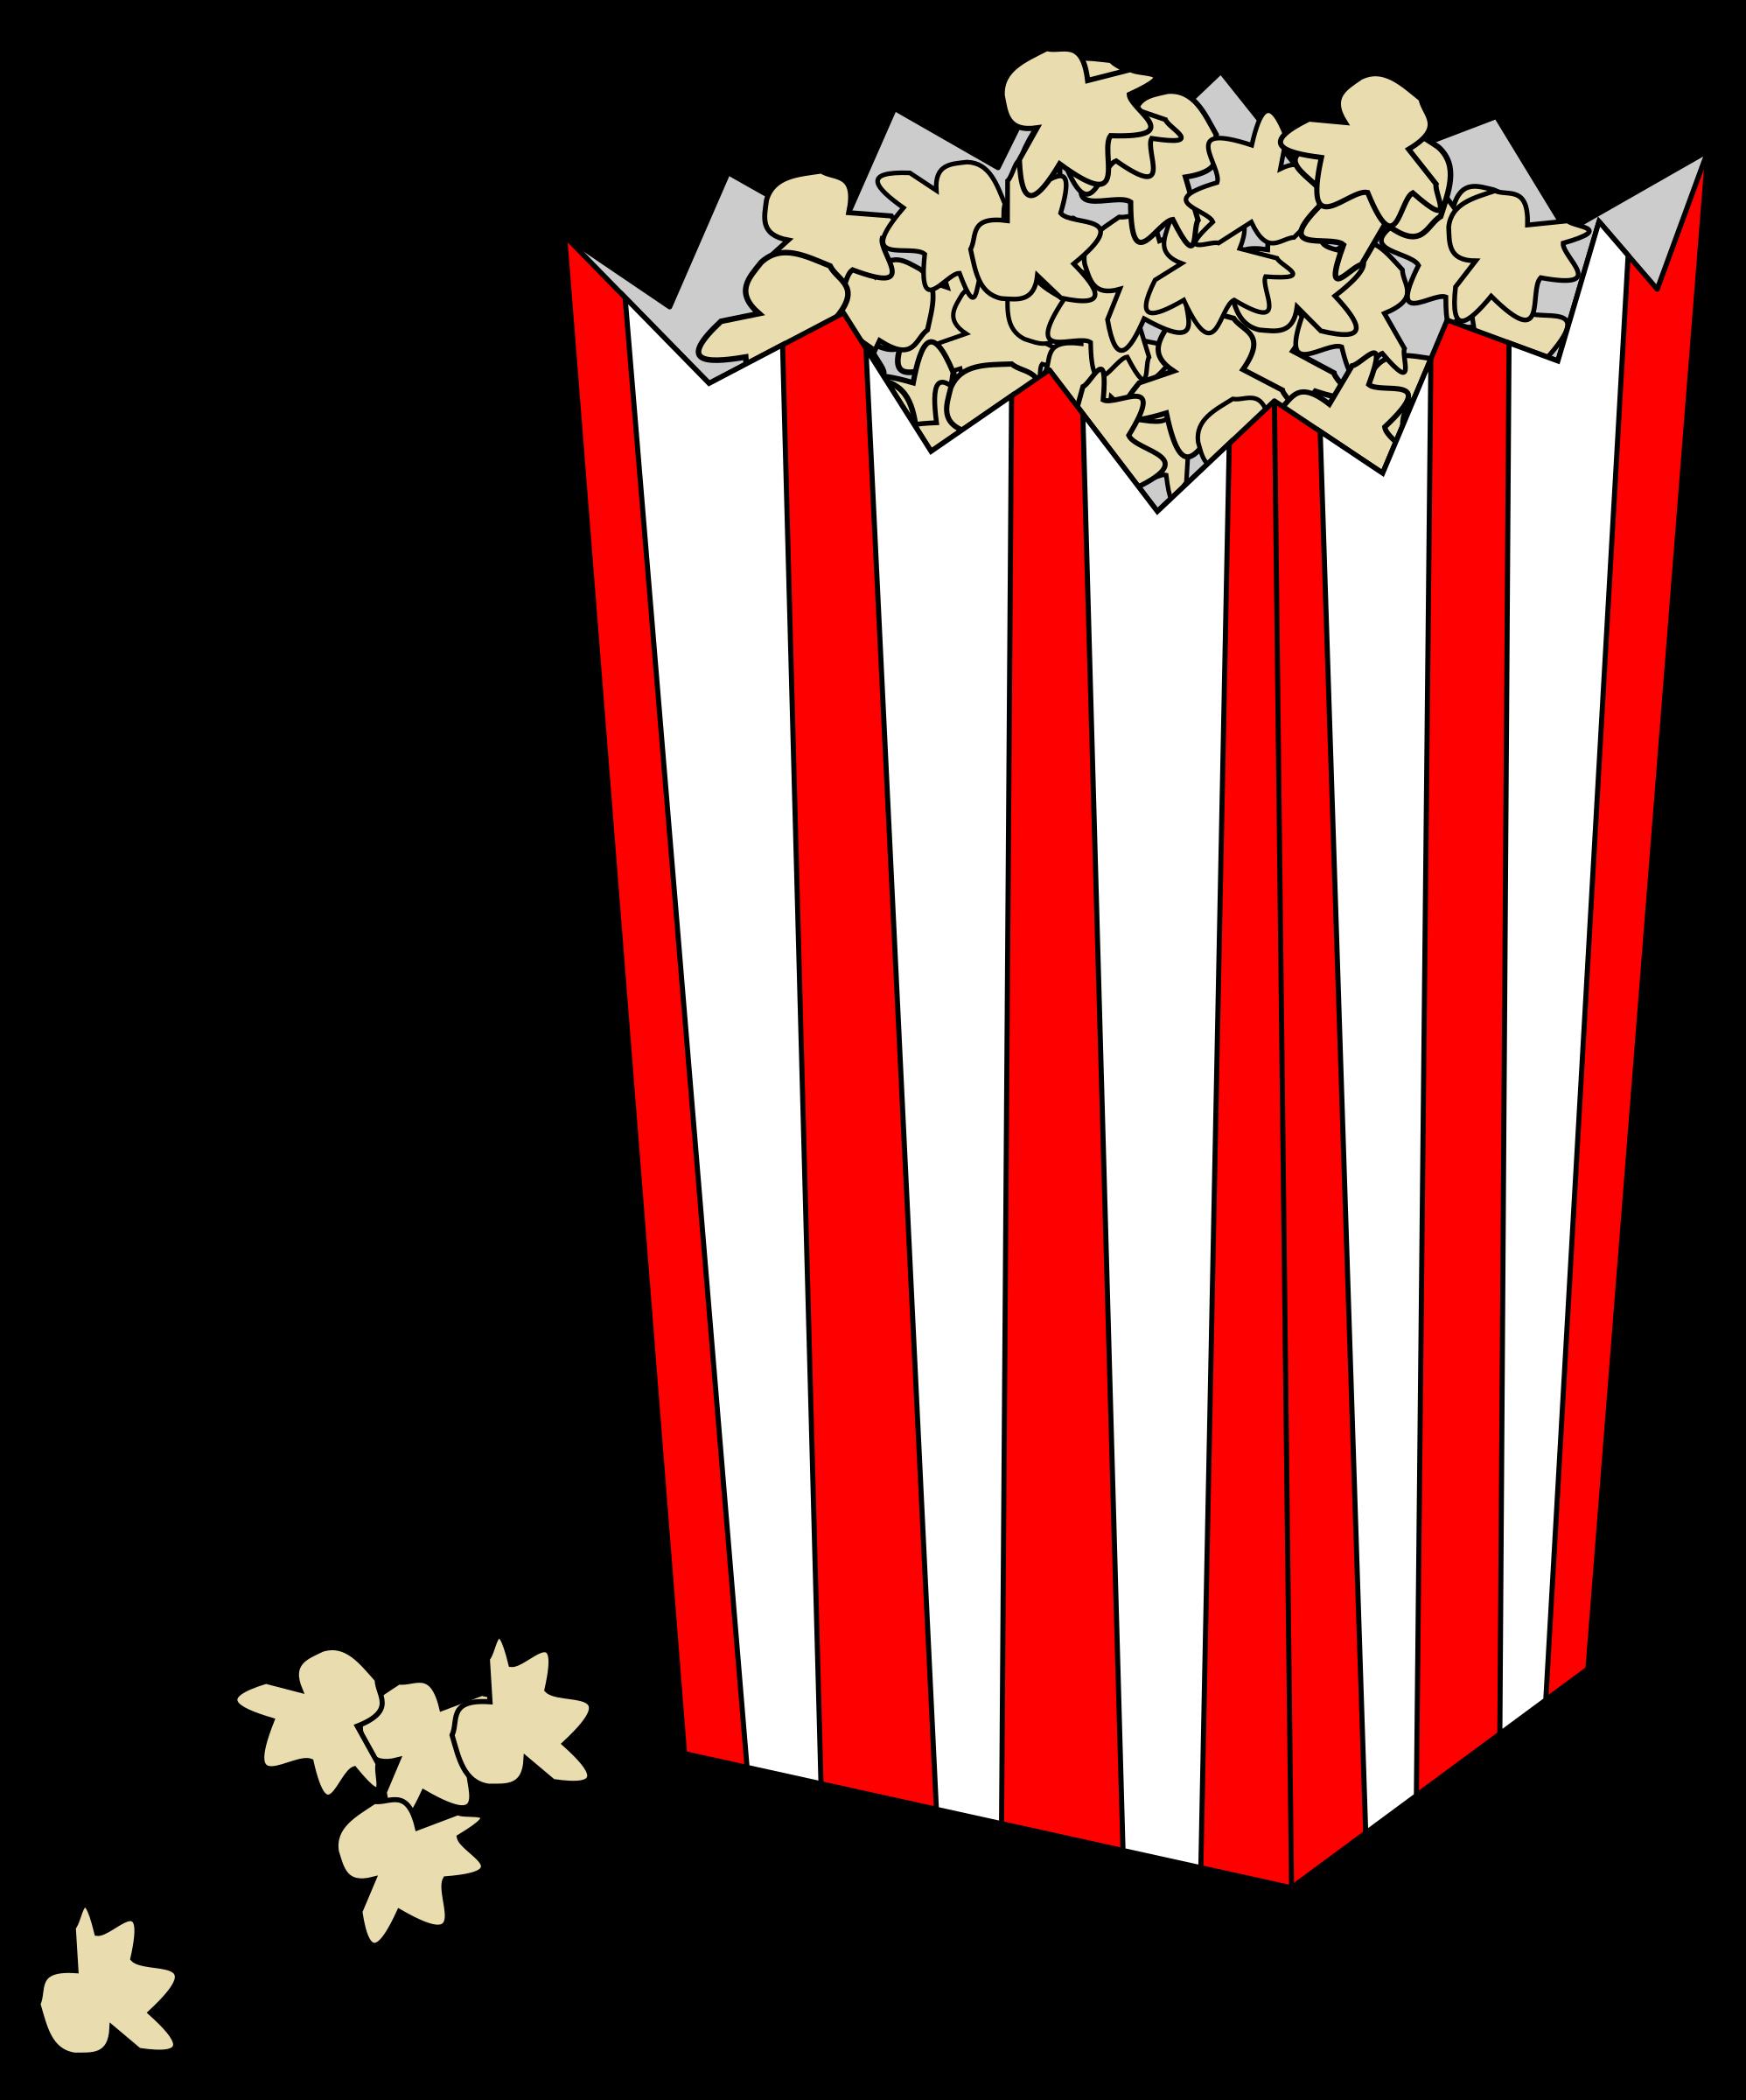 Clipart explosion popcorn. Movie bag big image